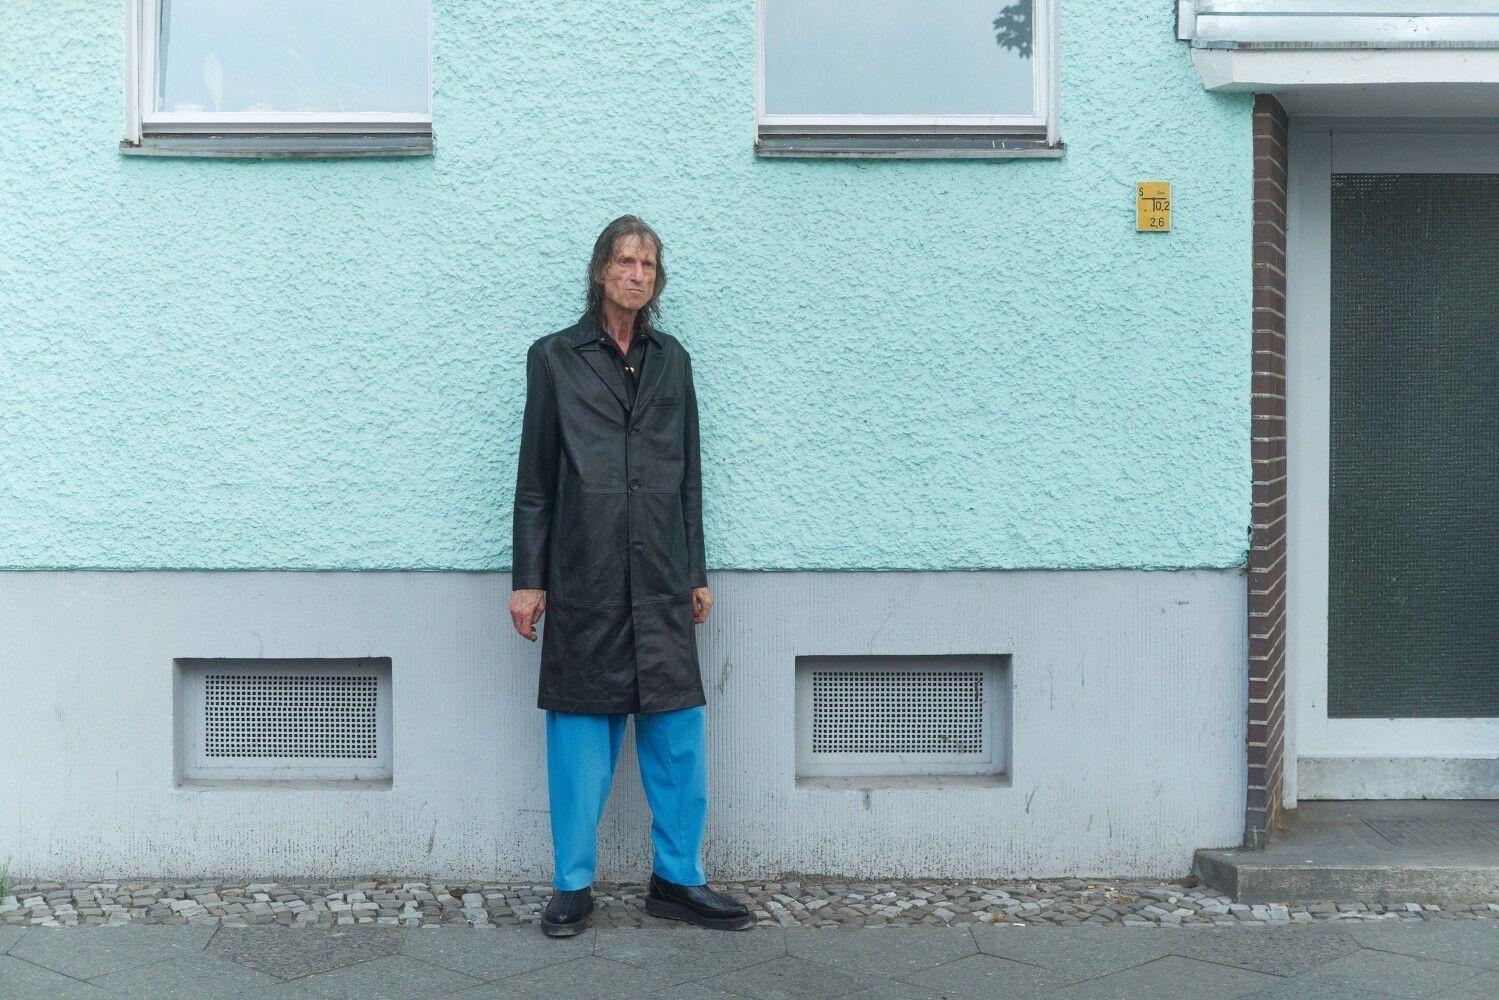 Daniel Roché c/o SHOTVIEW ARTISTS MANAGEMENT